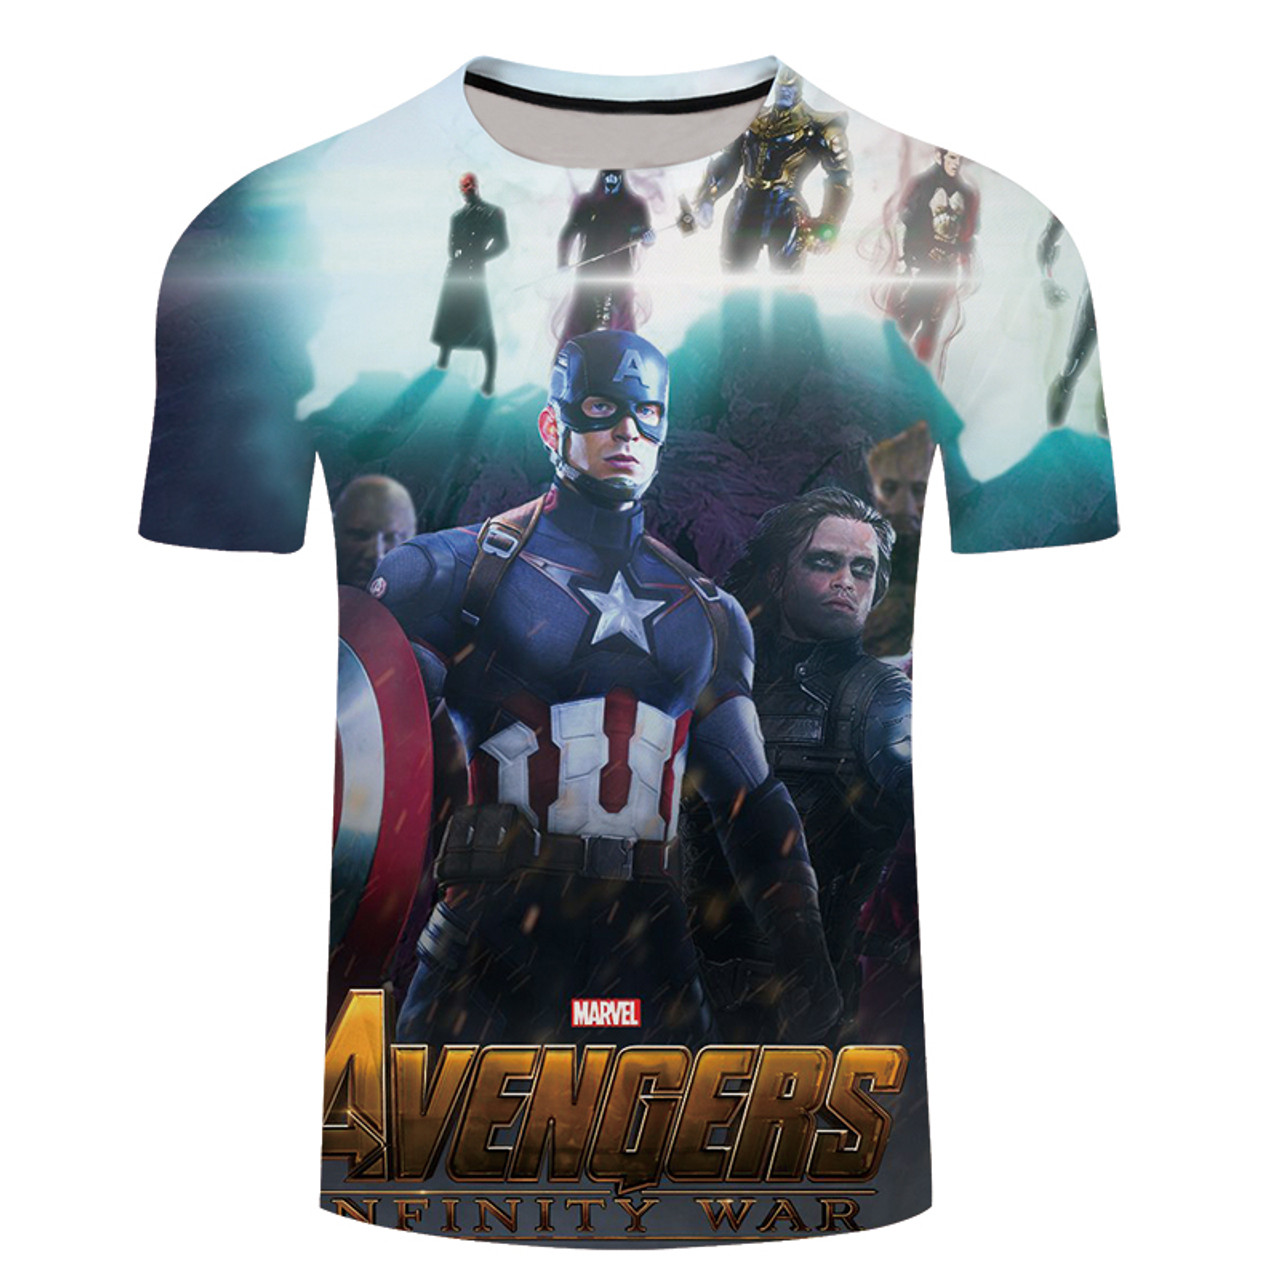 919c2428ba780 ... 2018 Marvel Avengers 3 Infinity War 3d Compression Short Sleeve T Shirt  Men New Fashion Summer ...